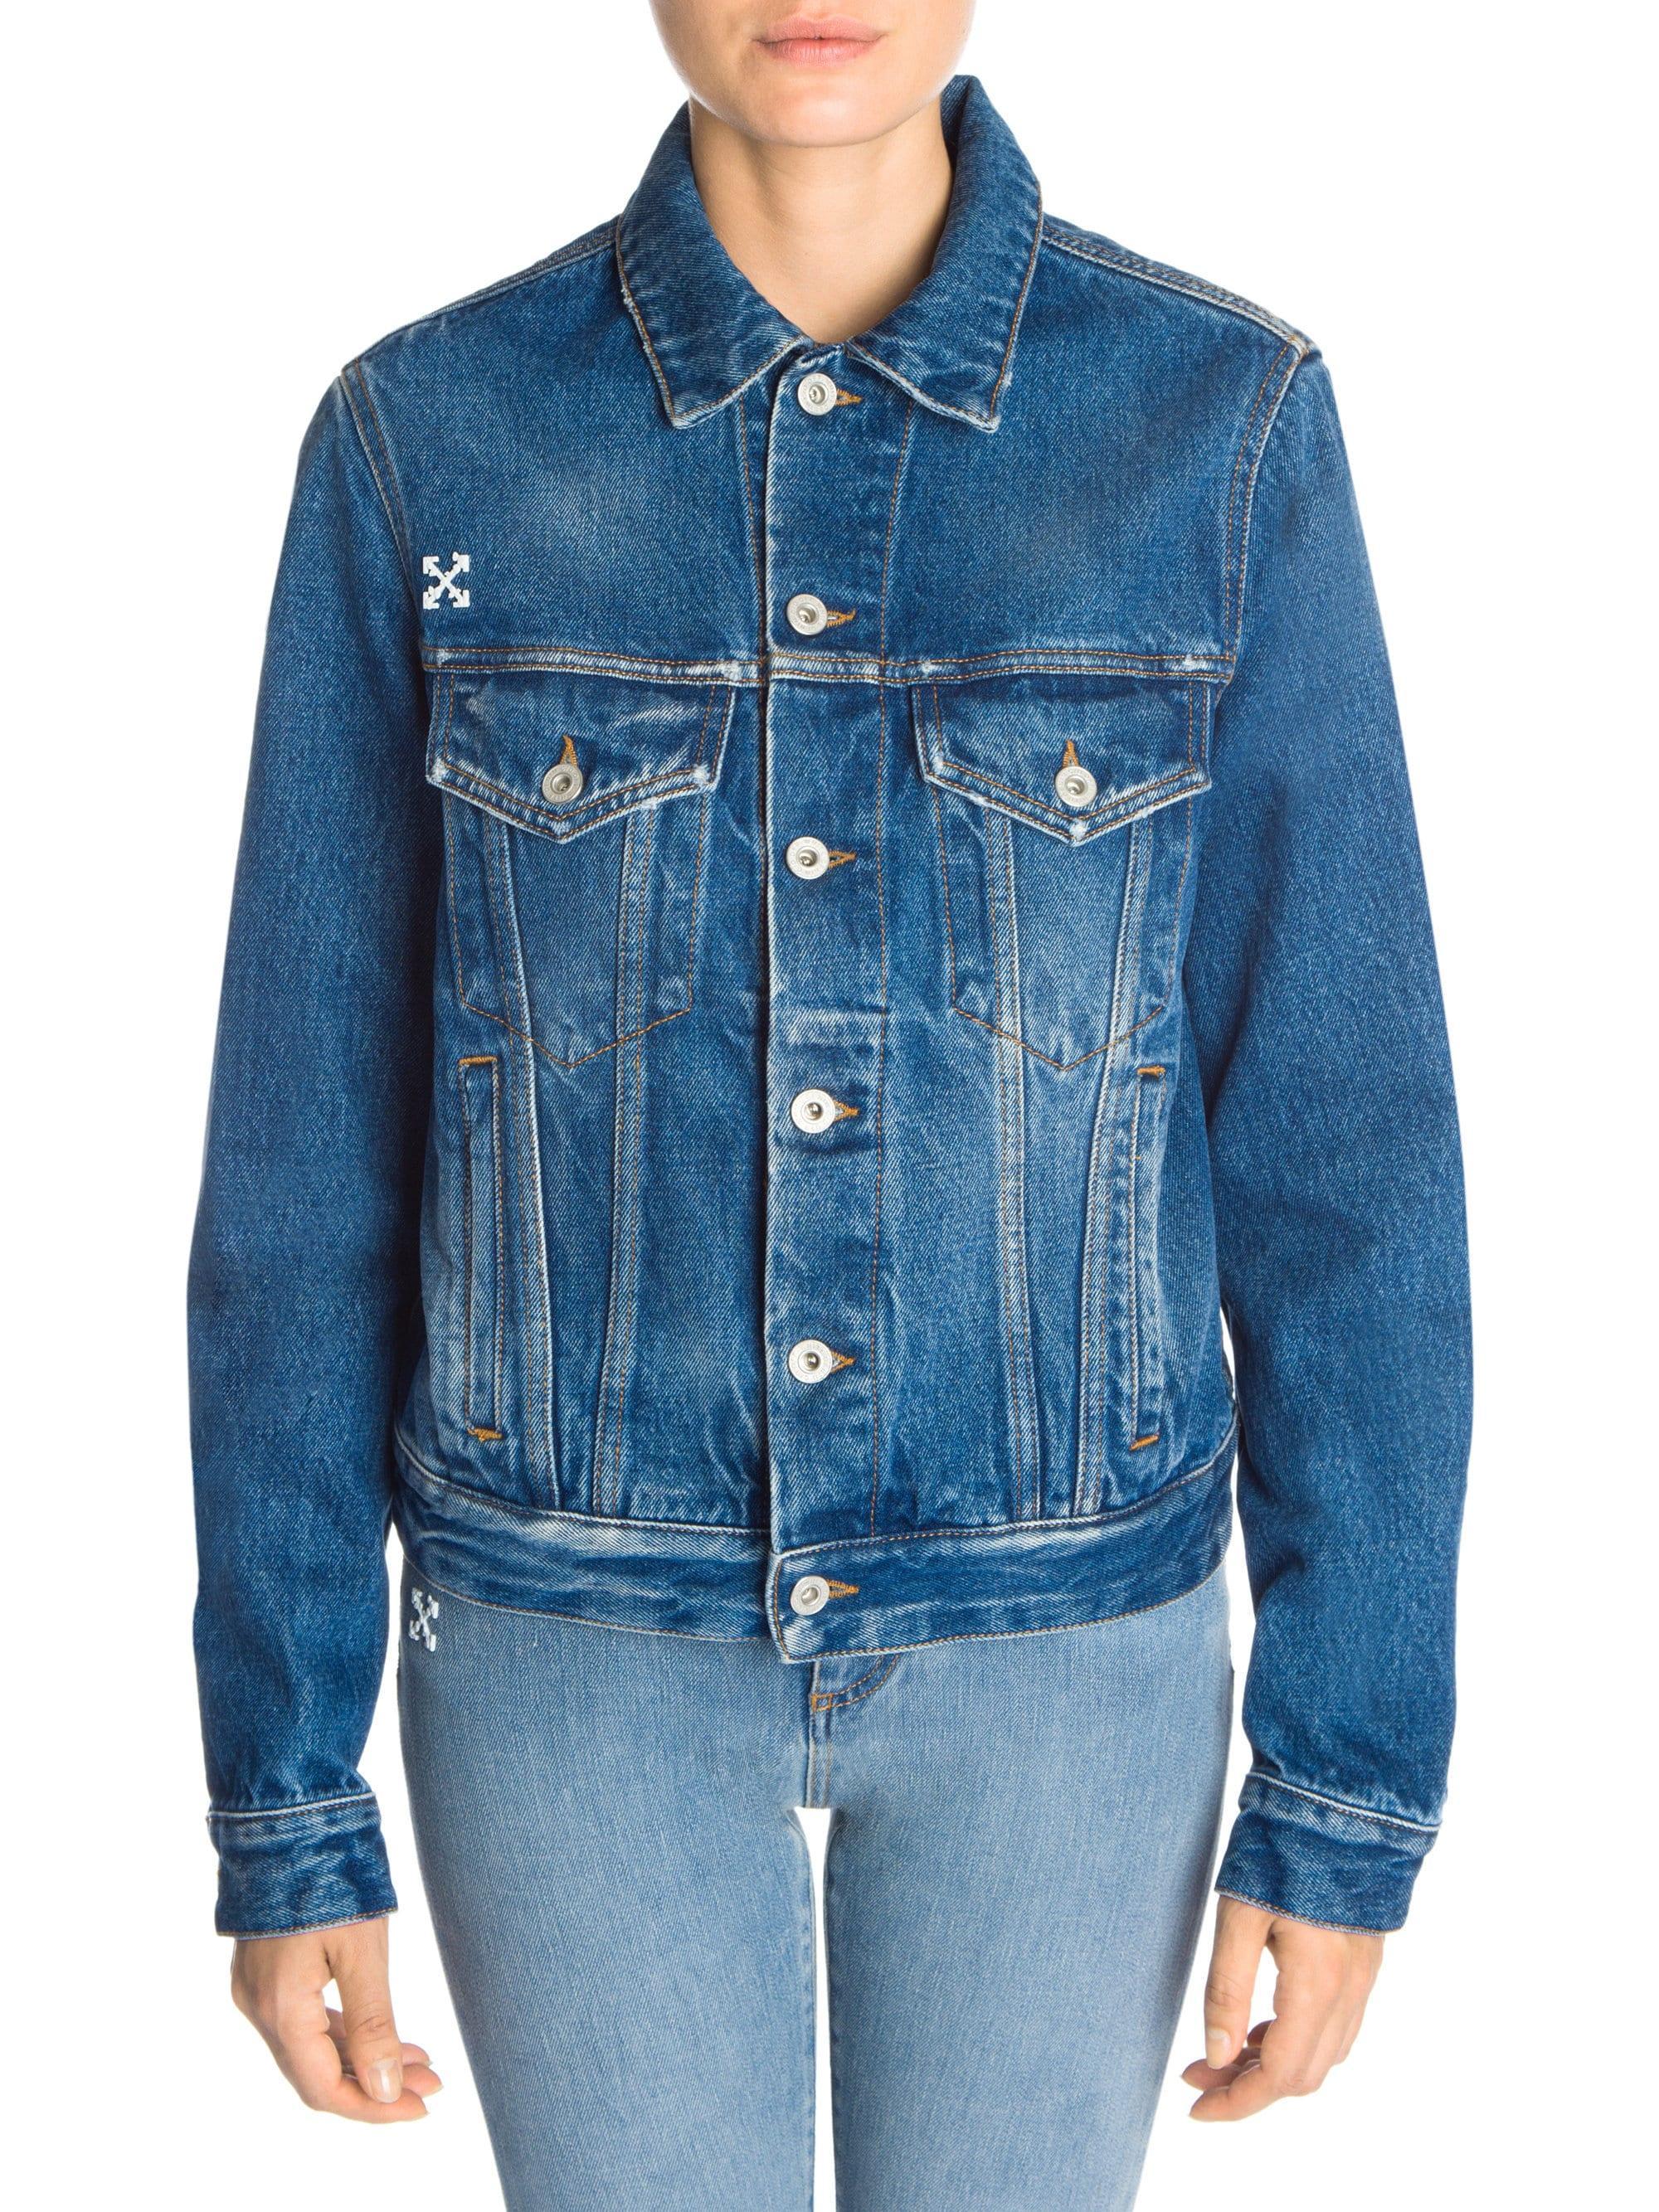 46d254081 Lyst - Off-White c/o Virgil Abloh Women's Denim Jacket - Blue Wash ...